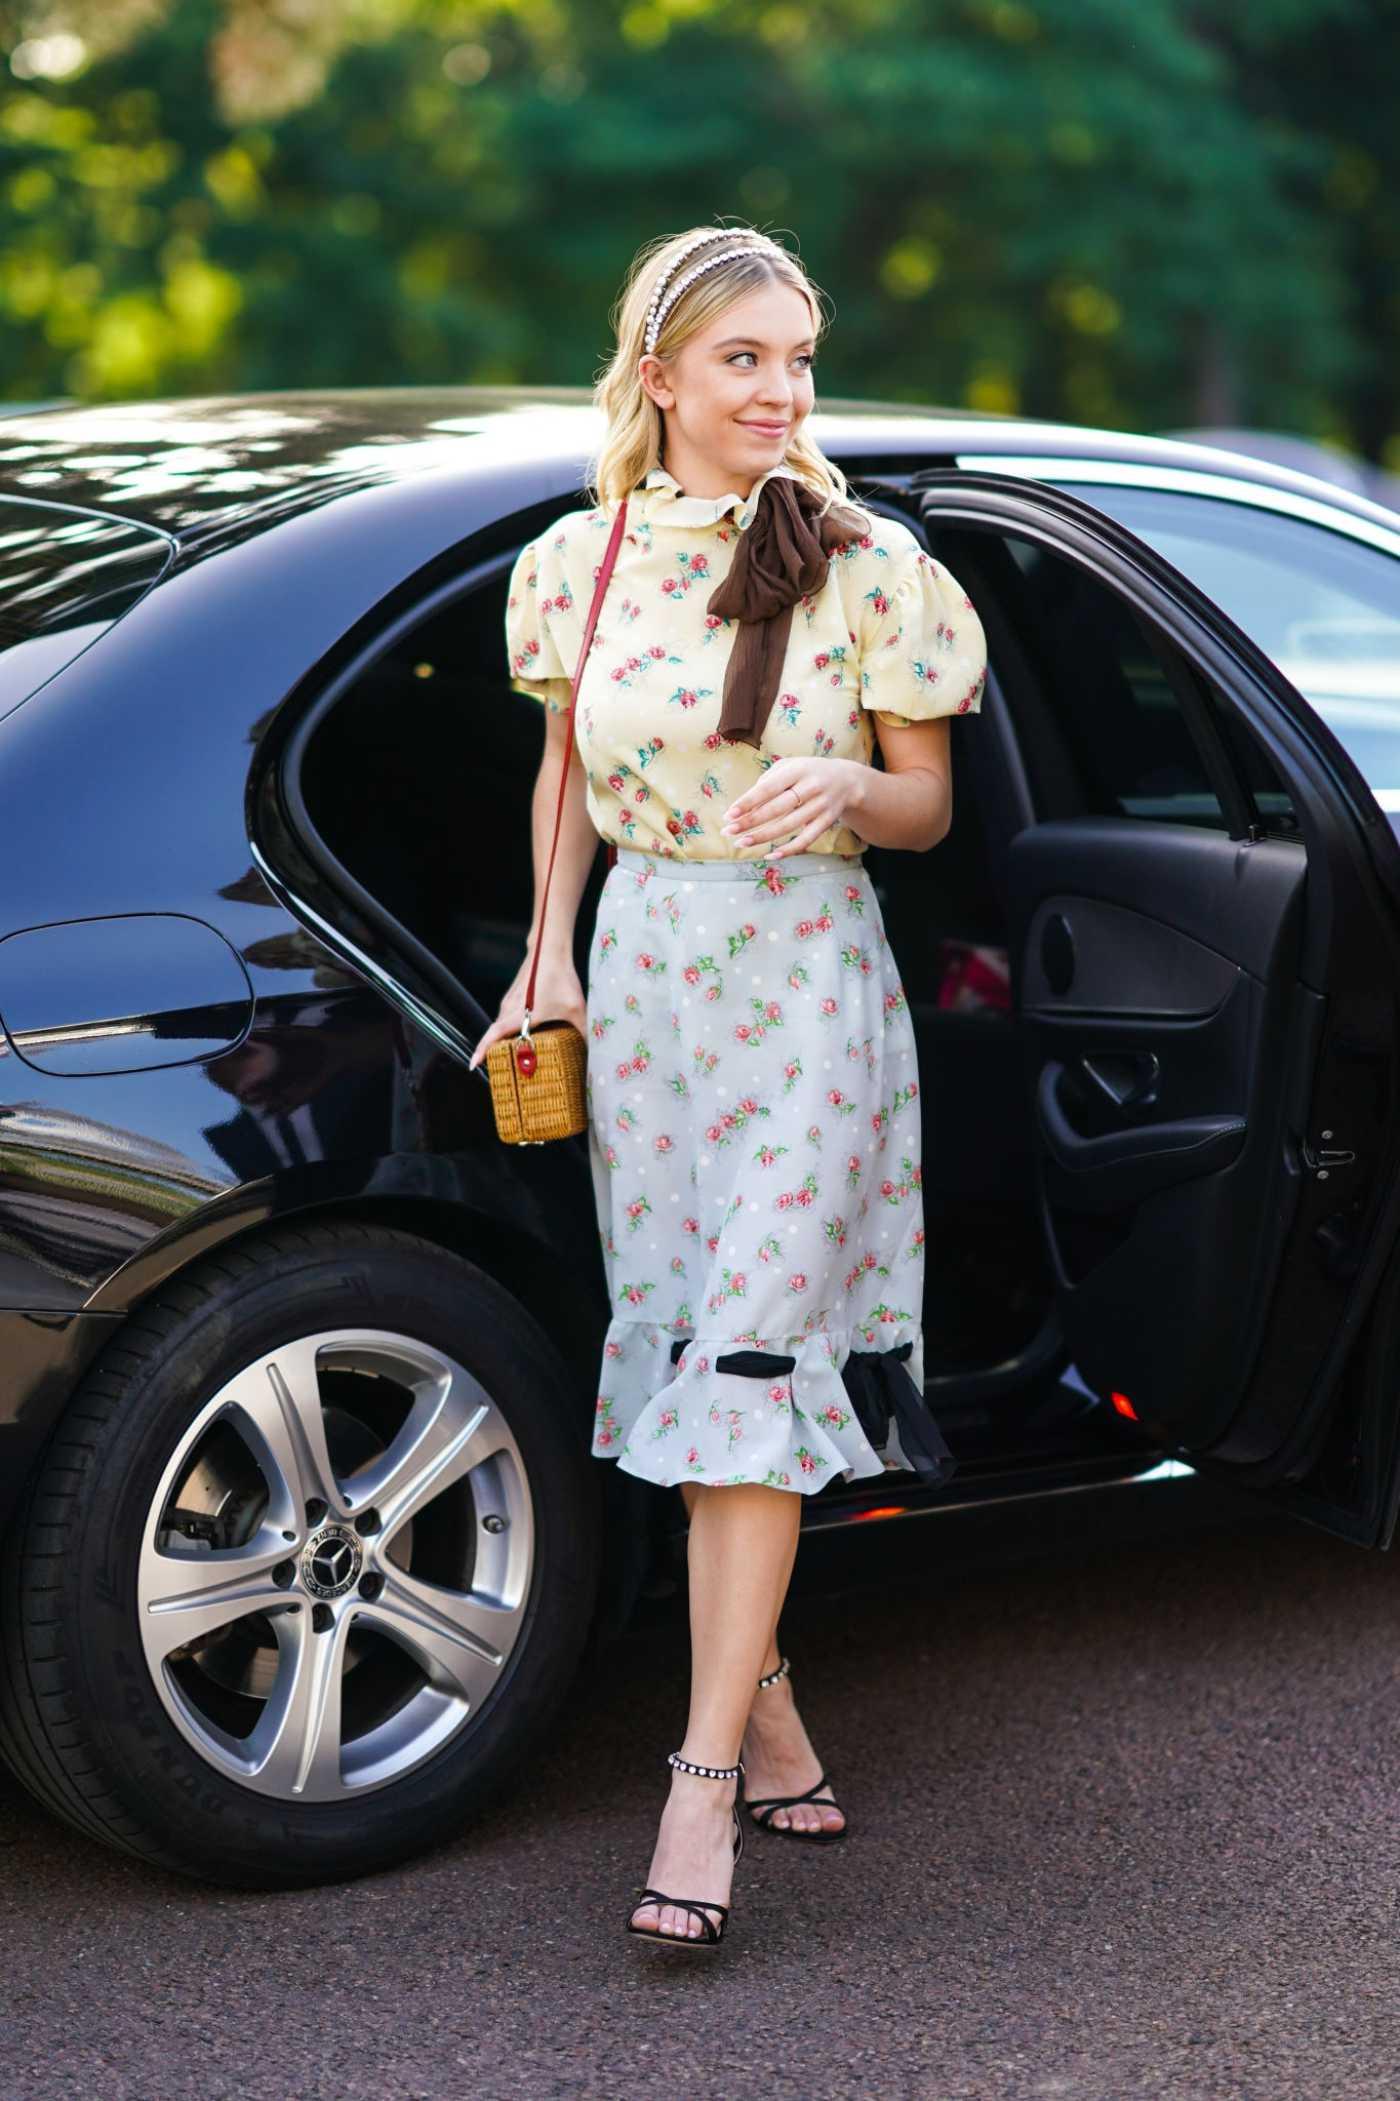 Sydney Sweeney Arrives at the Miu Miu Club Event in Paris 06/29/2019